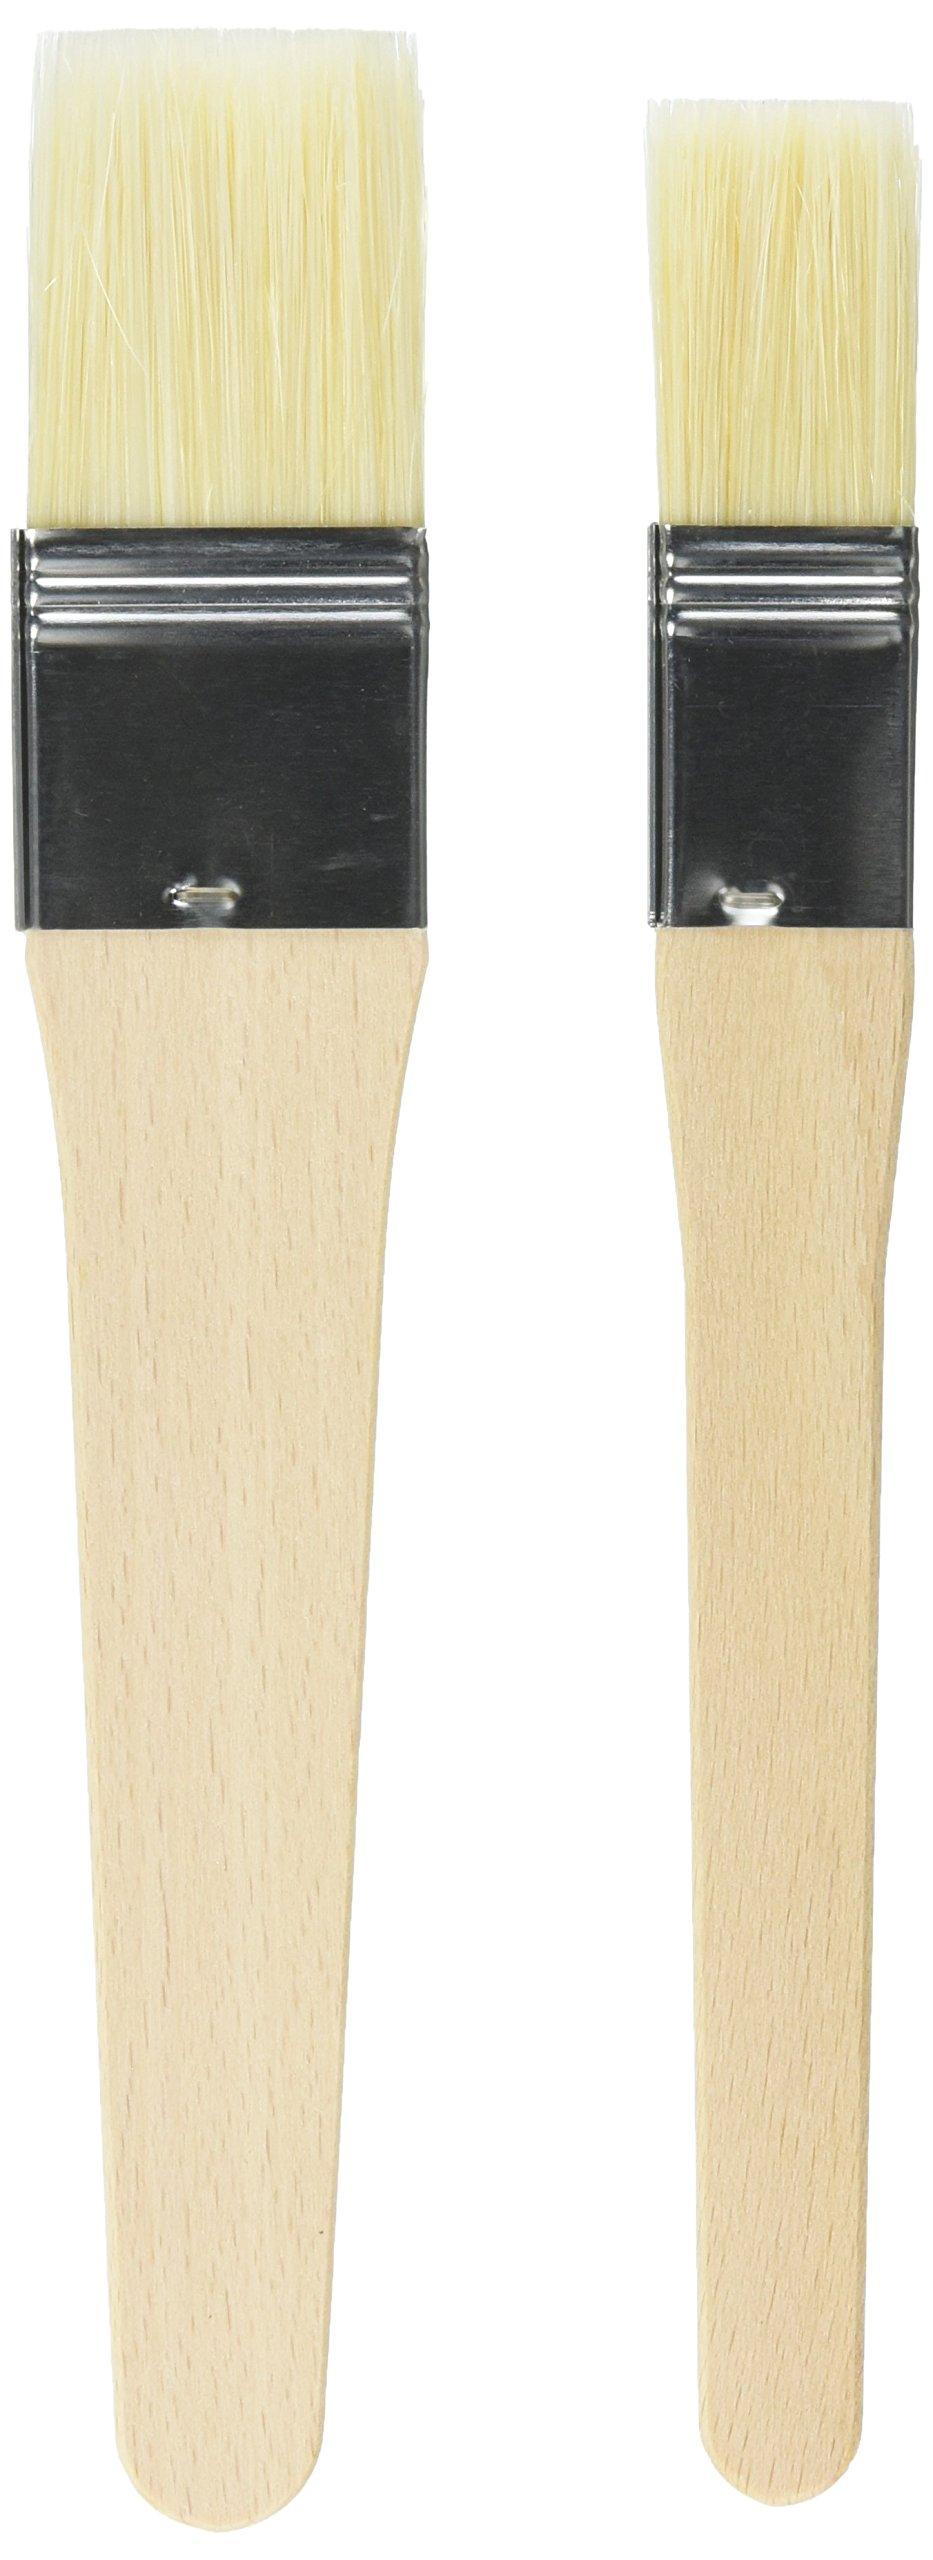 Kaiser 769516 Pastry Brush-Set 2Pcs Of Wood, Brown